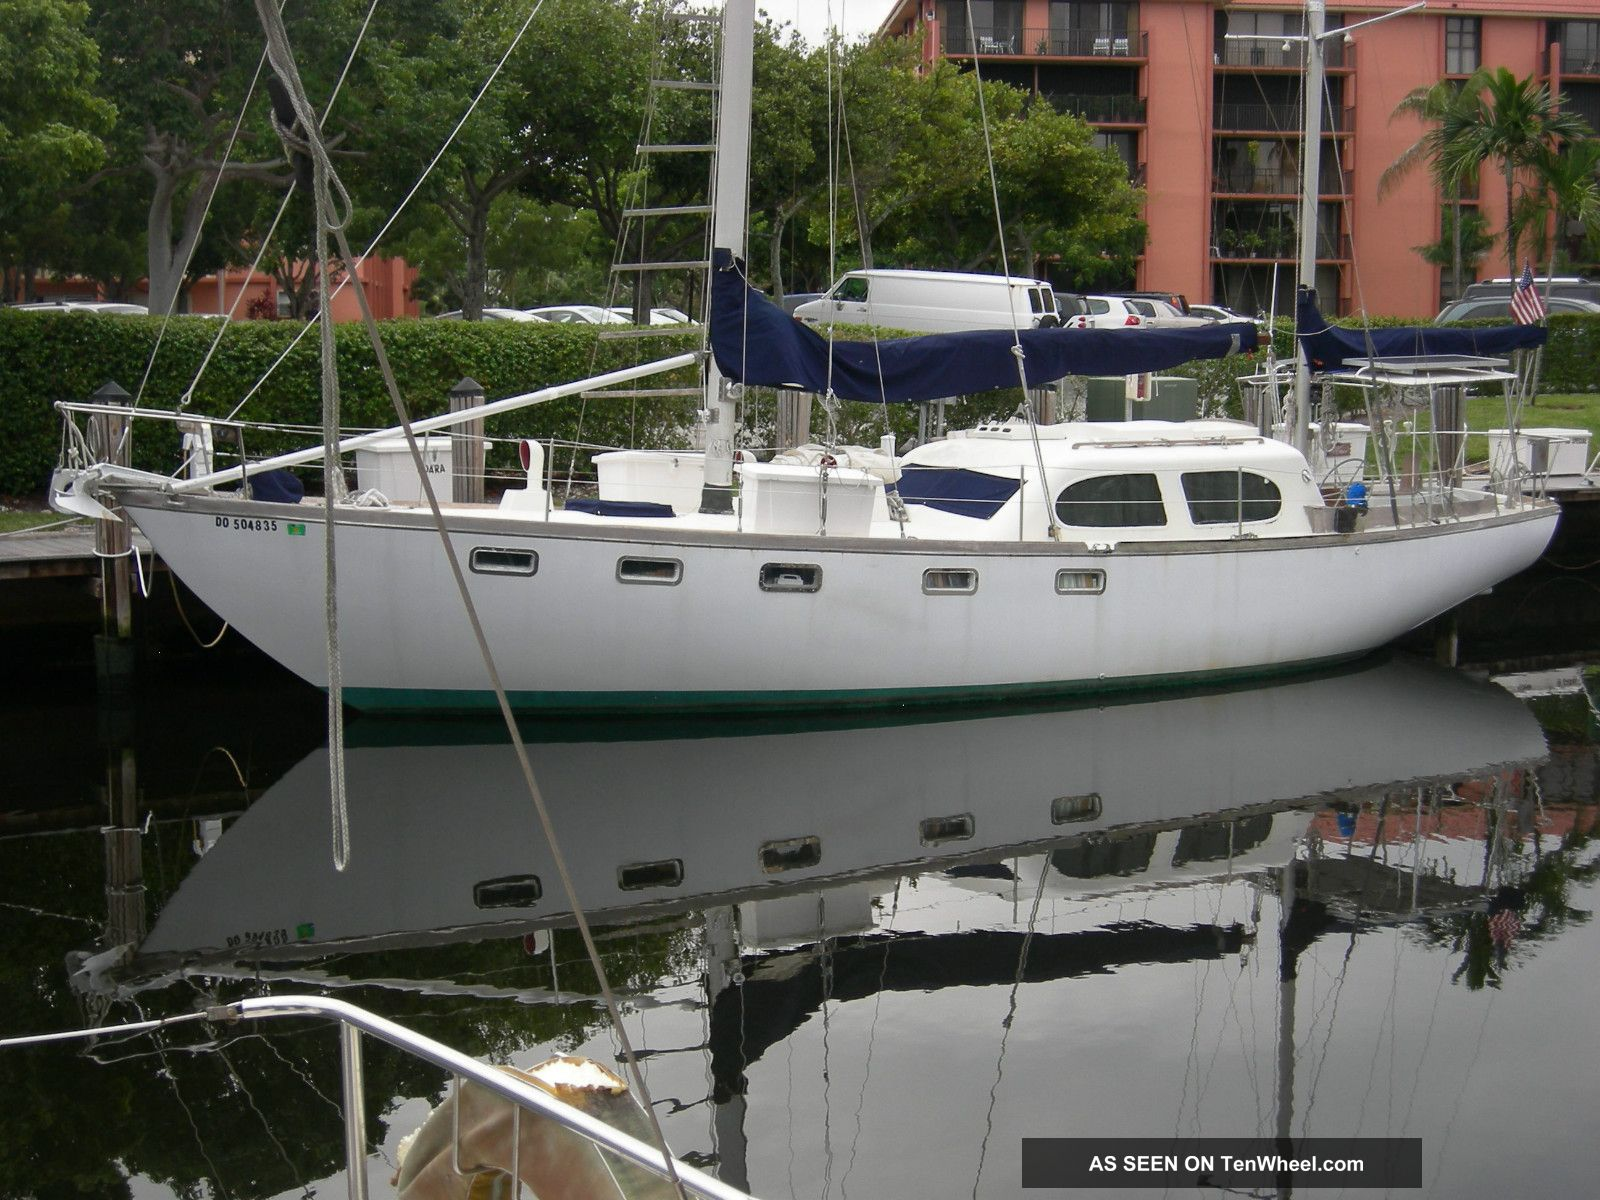 1965 Pearson Countess Sailboats 28+ feet photo